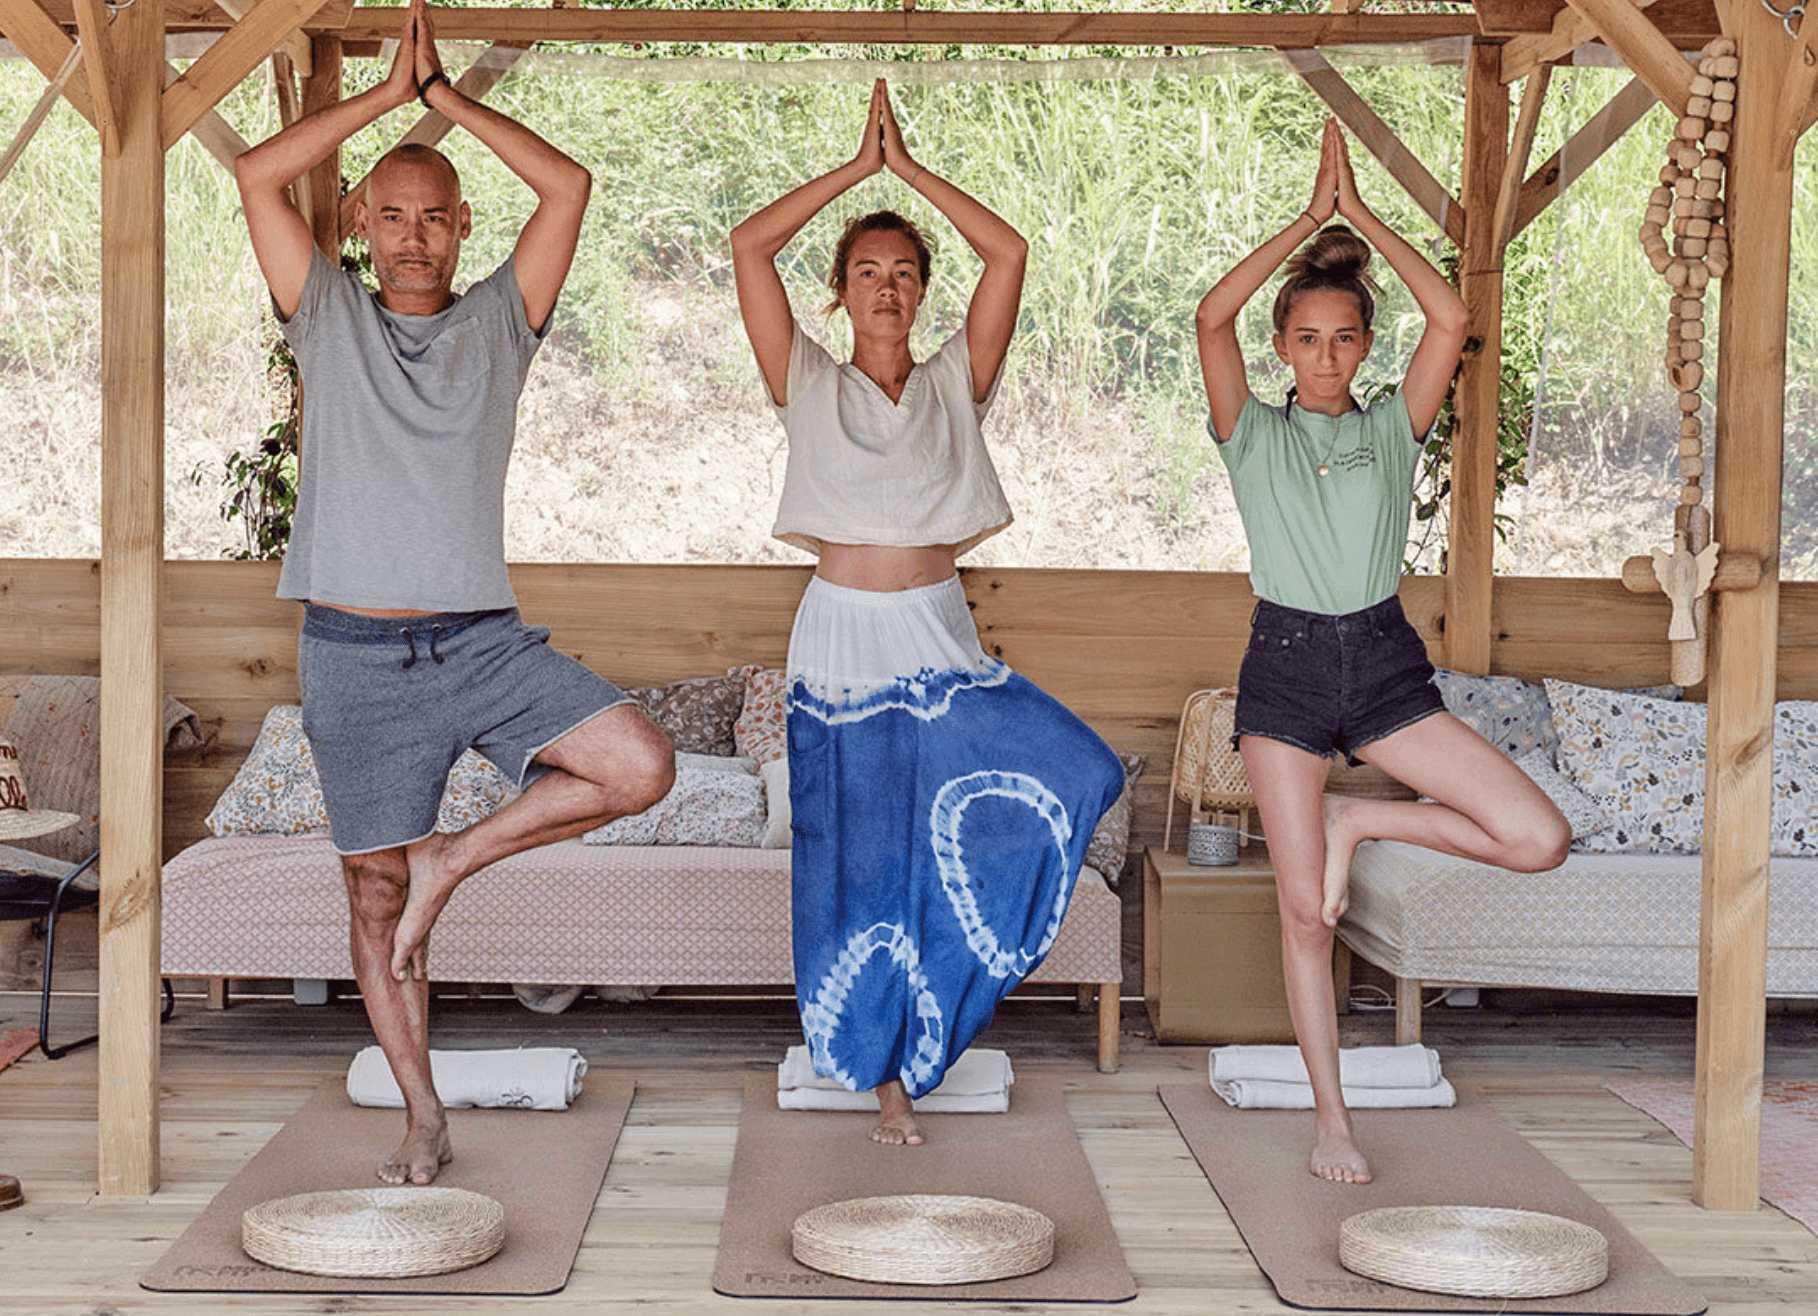 casa sallusti cours yoga nice